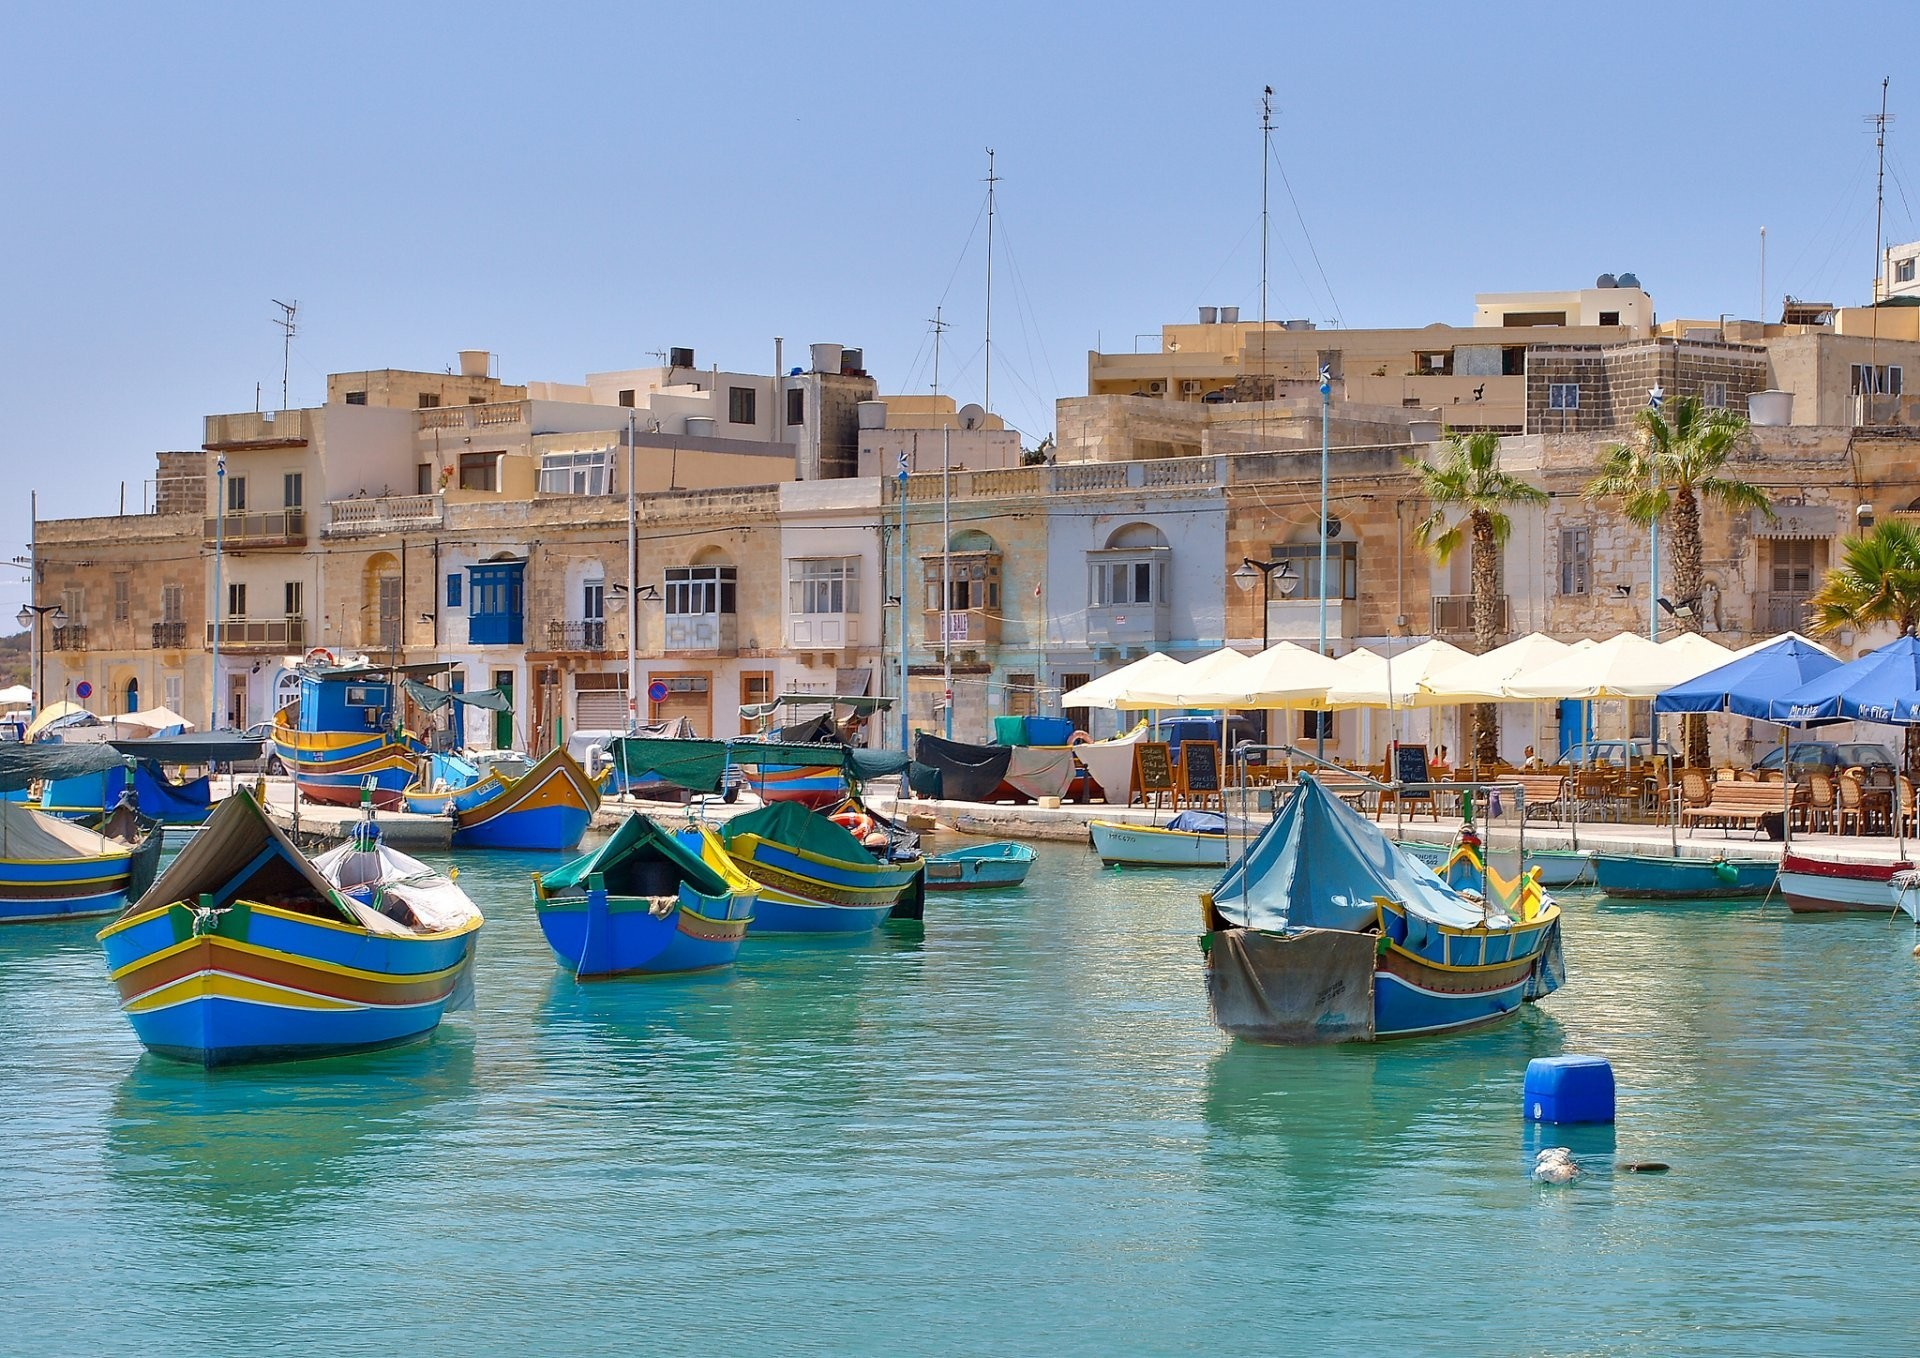 Res: 1920x1358, malta marsaxlokk town mediterranean sea boat pier house buildings